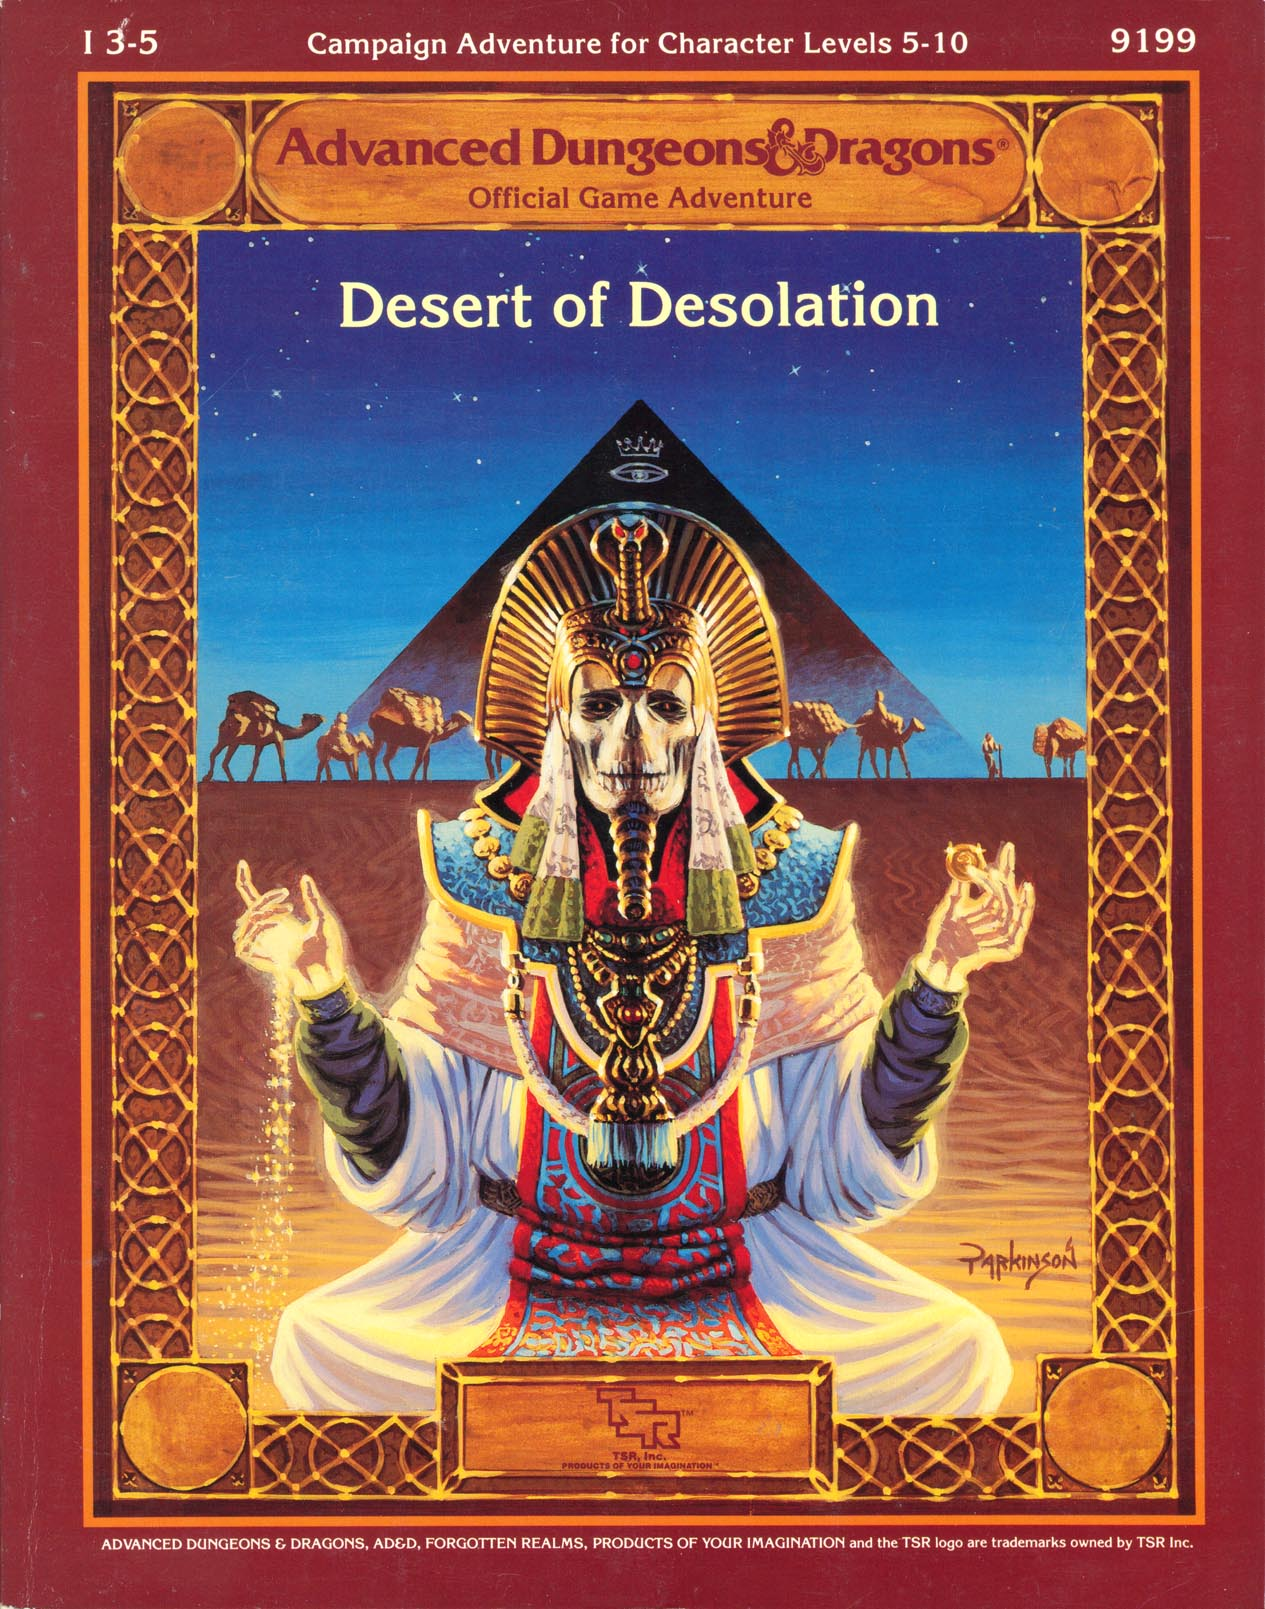 Desert of Desolation